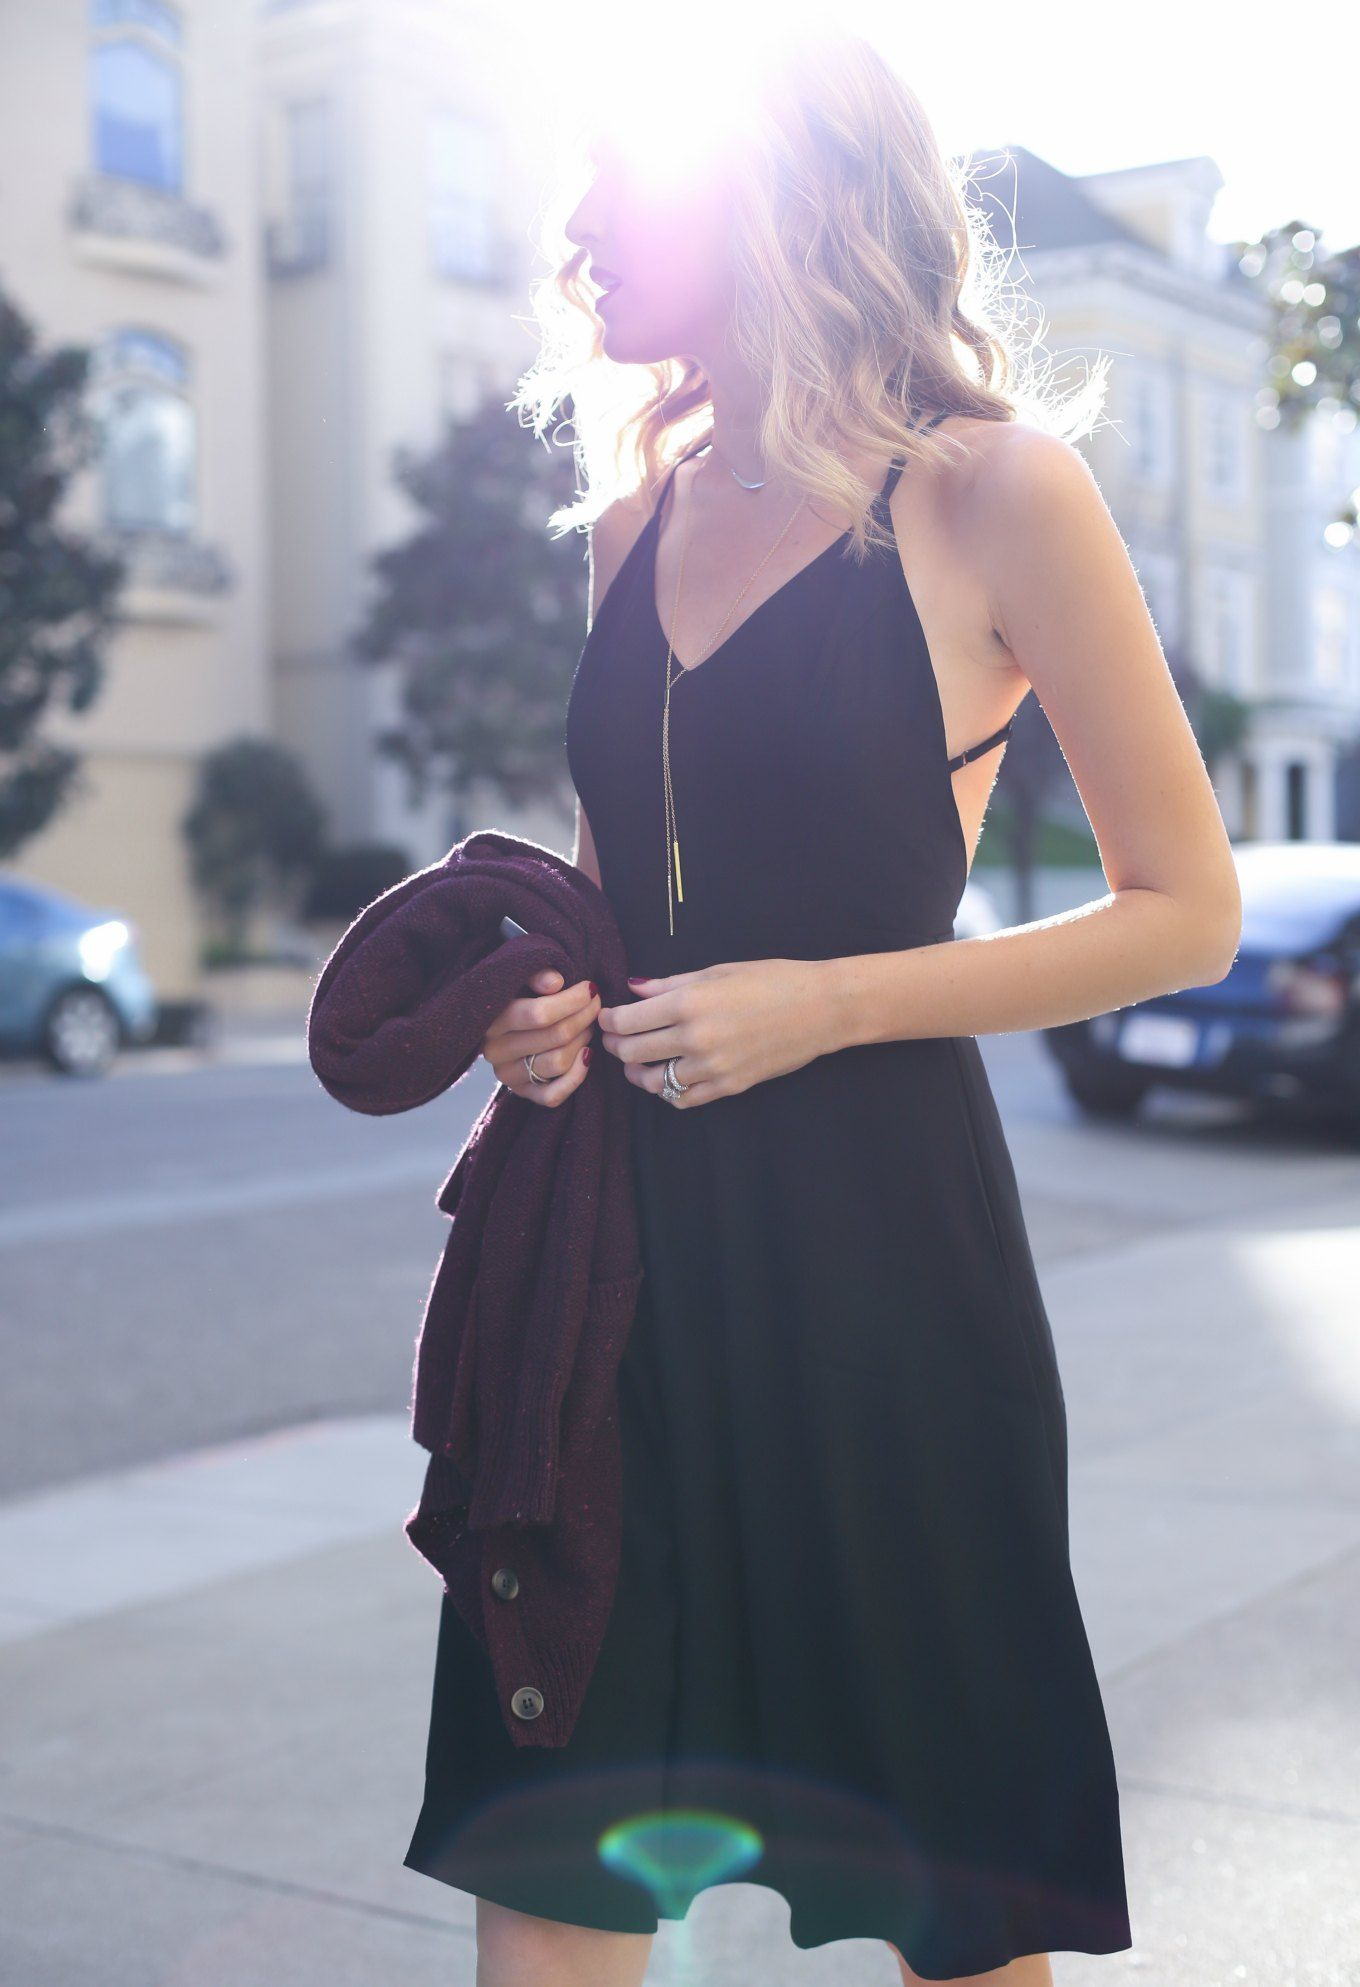 Day to Night: Slip Dress + Long Cardigan | MemorandumMEMORANDUM, formerly The Classy Cubicle